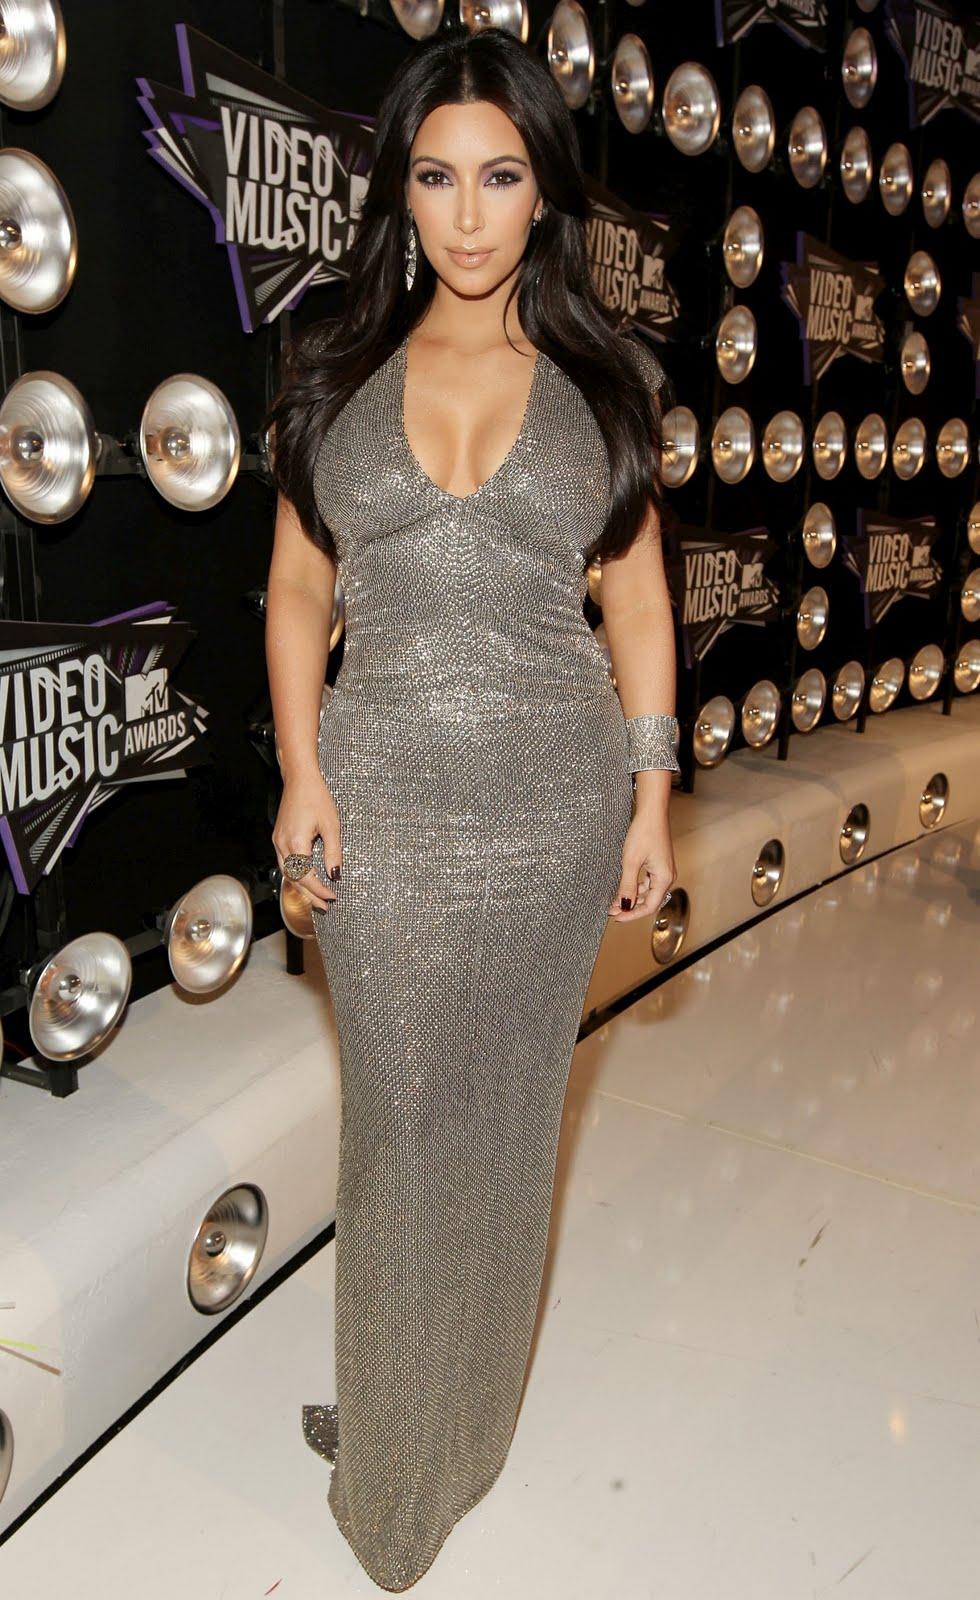 http://2.bp.blogspot.com/-t-VV846XENE/TqP3LmwaPPI/AAAAAAAAFR0/hqzWD52WBA8/s1600/Kim-Kardashian-95.jpg